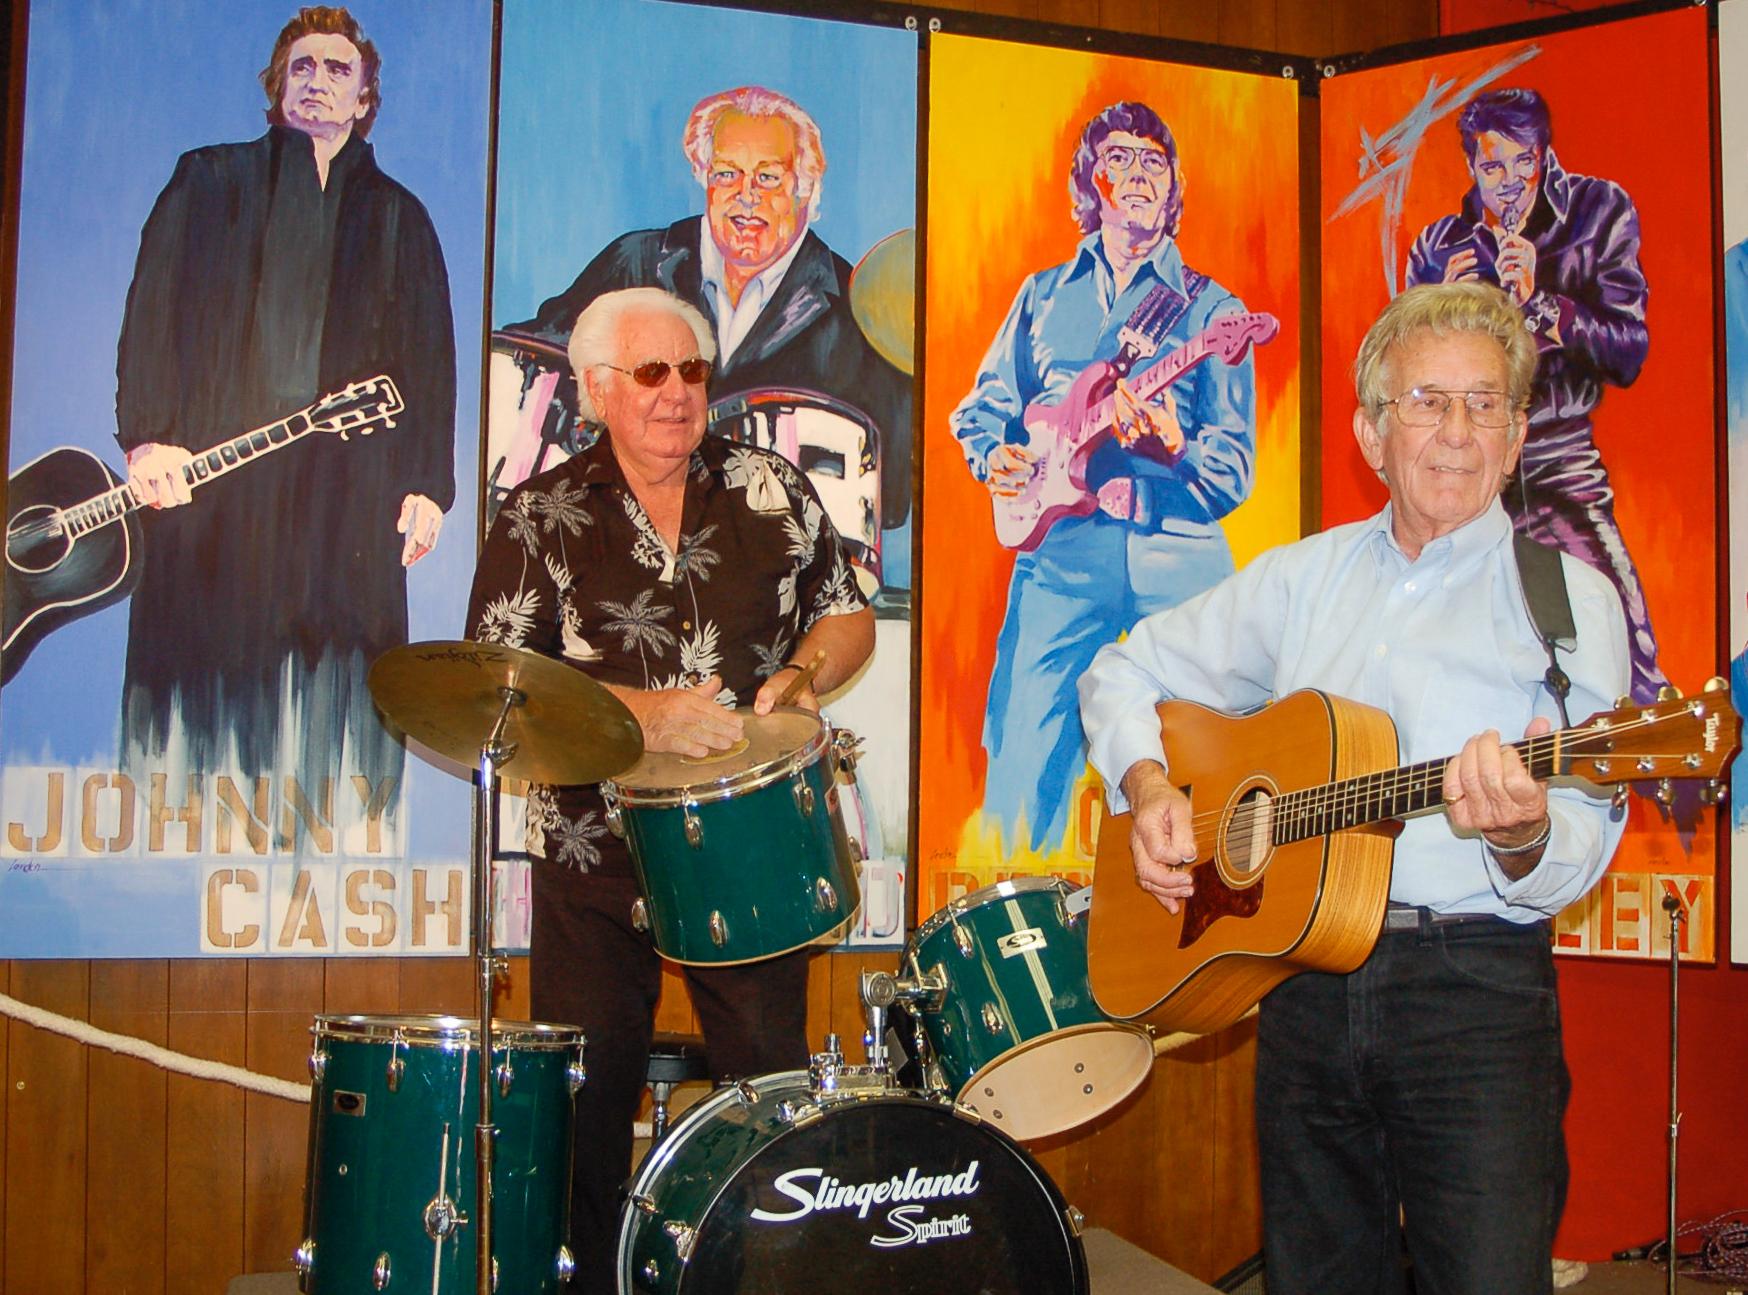 W.S. Holland an den Drums mit Rayburn Anthony an der Gitarre in der Rock'n Roll Hall of Fame